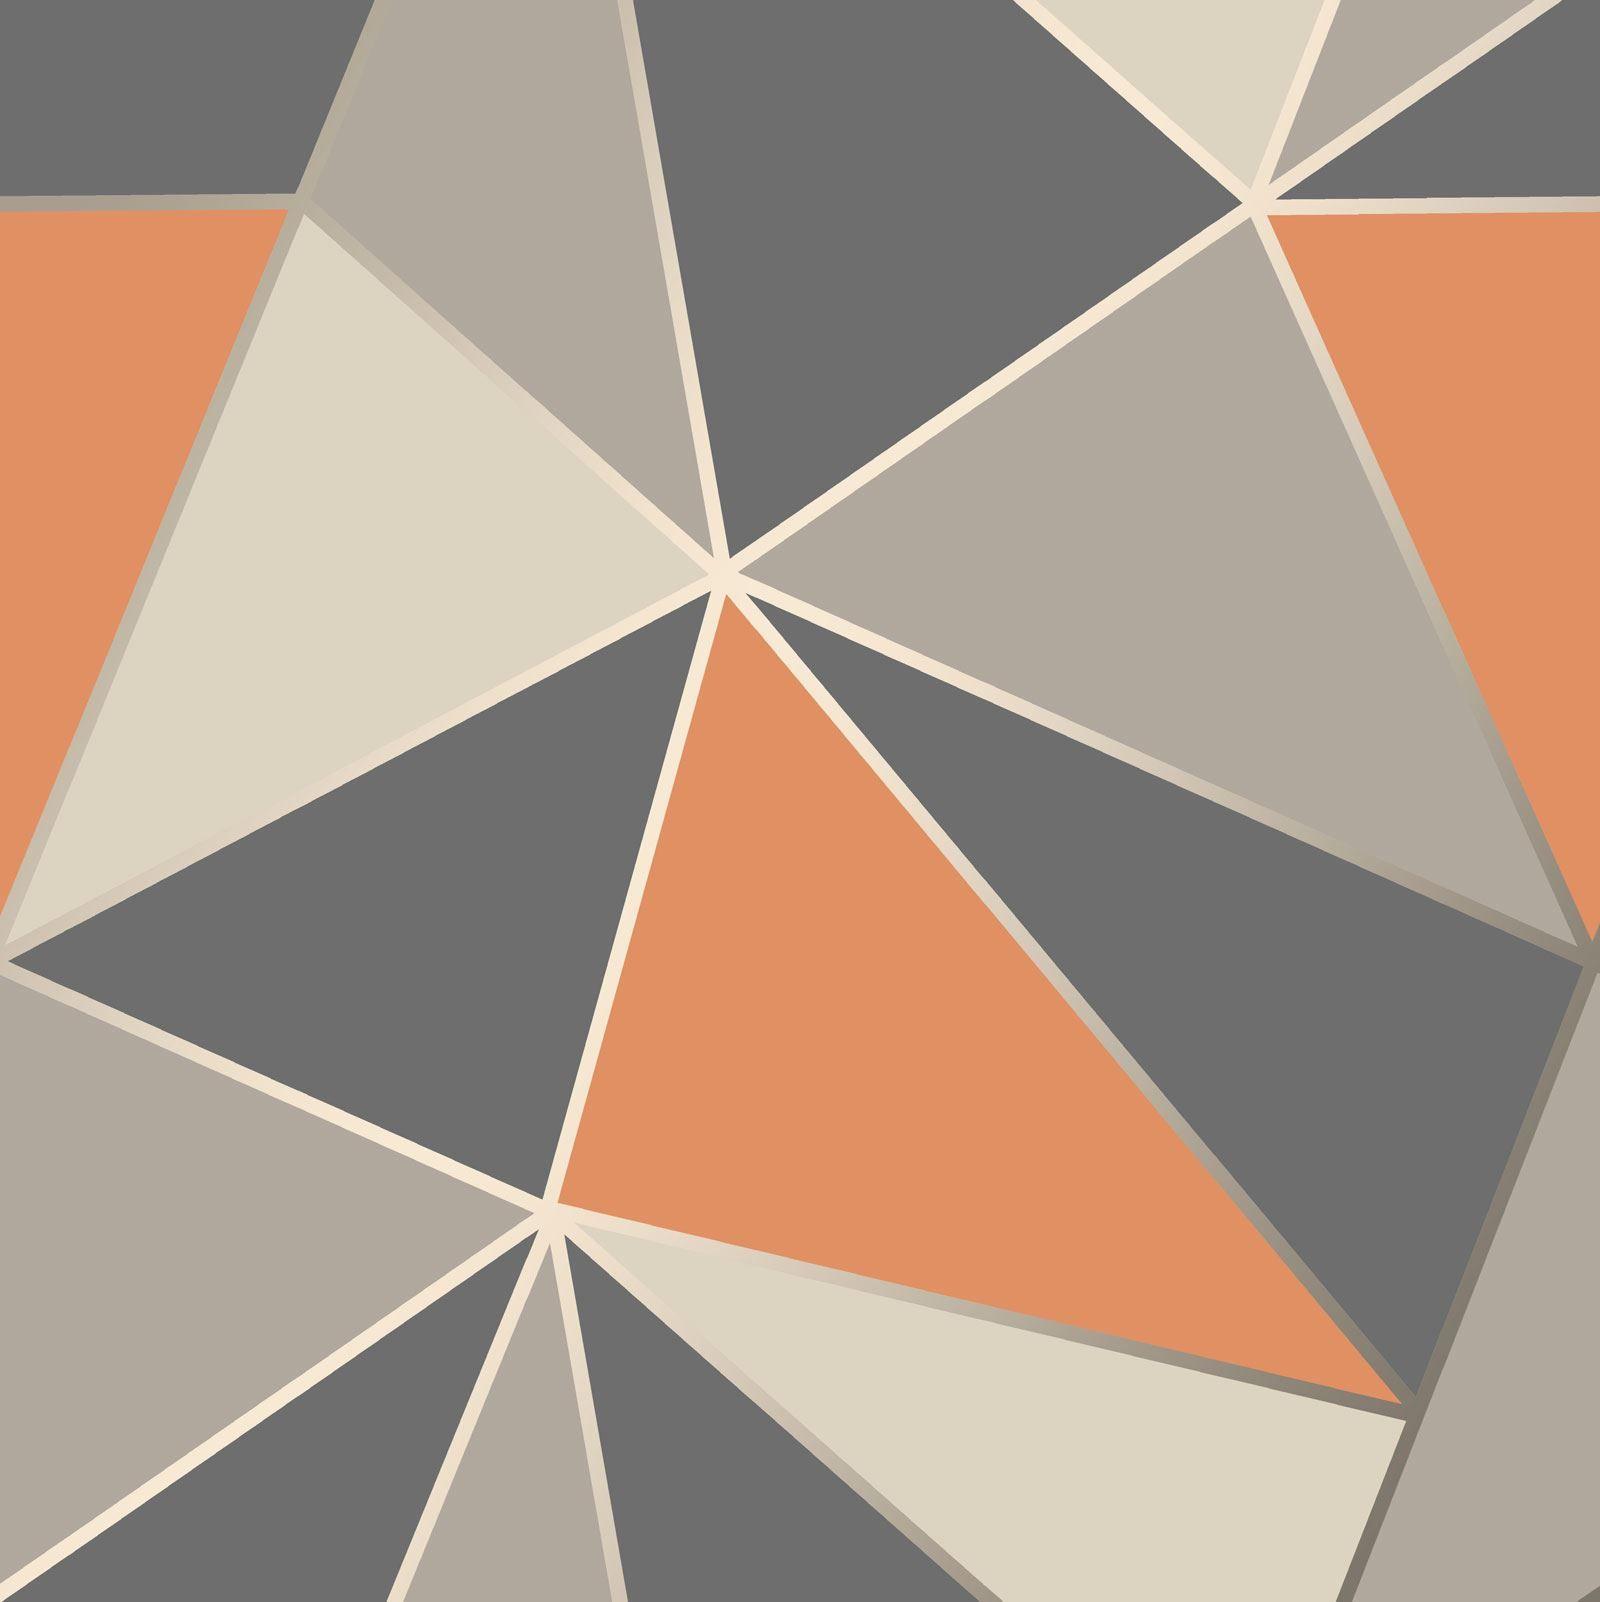 Apex Geometric Wallpaper Luxury Modern Metallic Fine Decor Orange Grey Silver